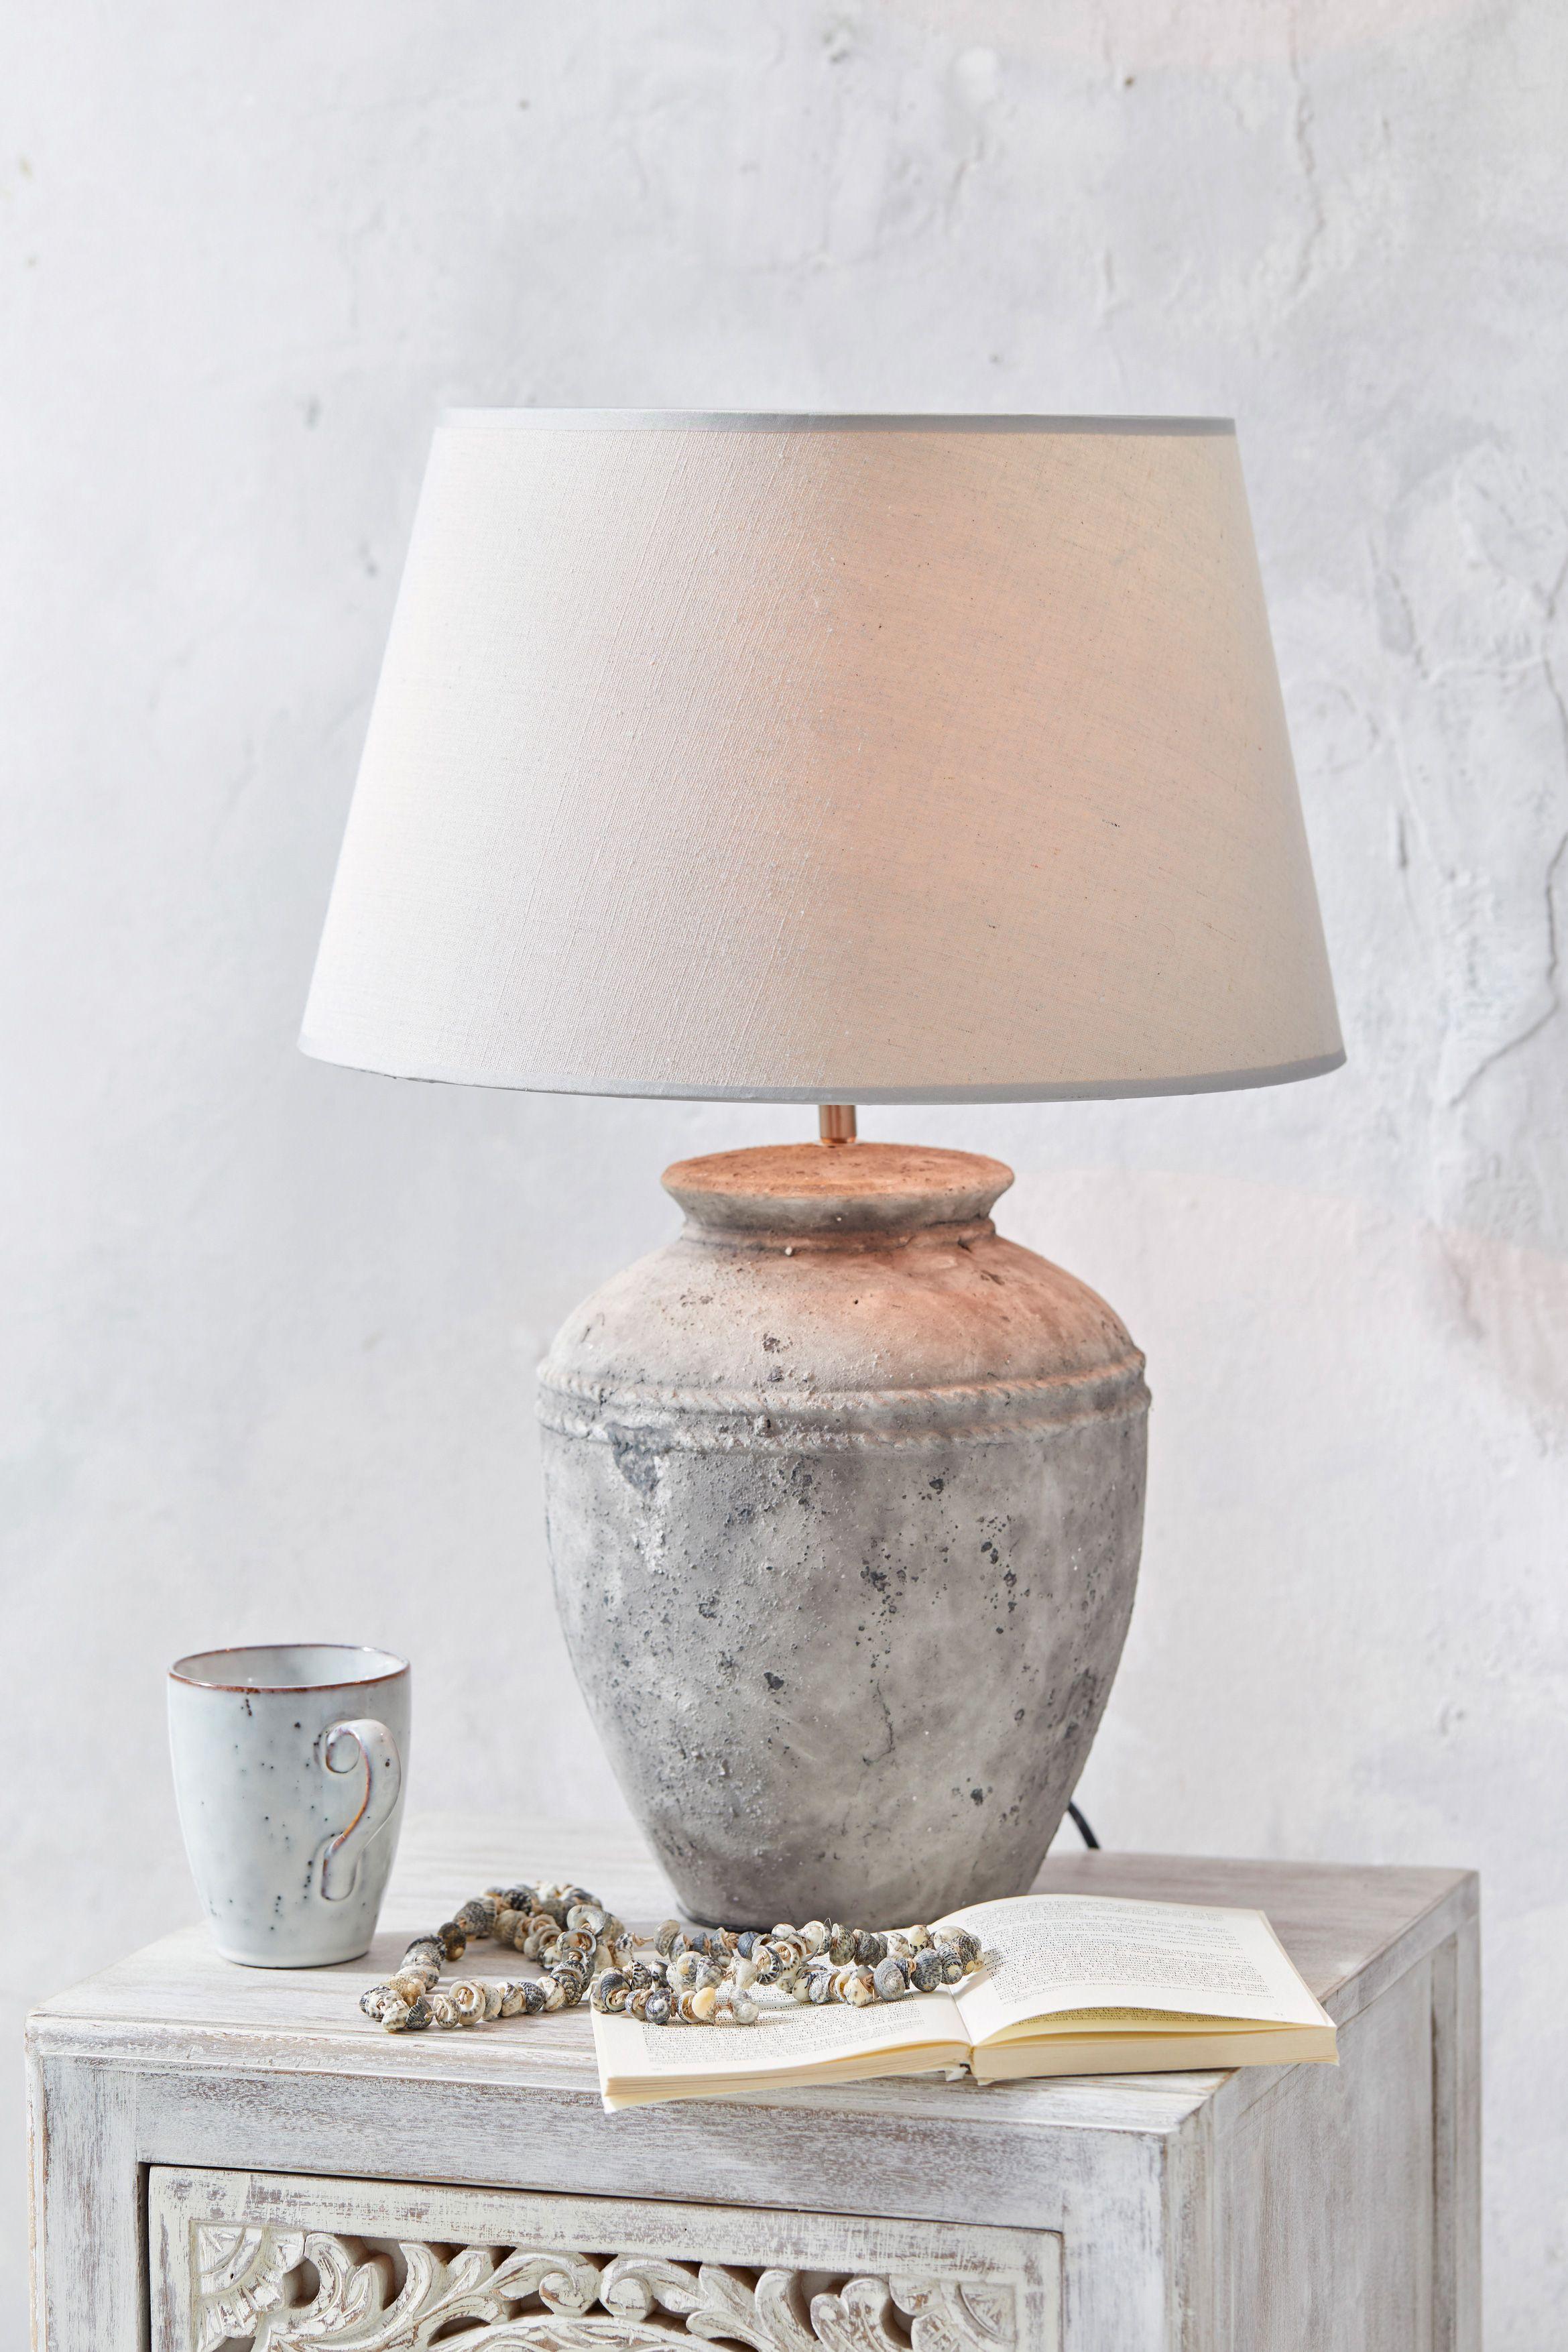 Une Lampe A Poser Tres Originale Avec Son Pied En Ceramique Facon